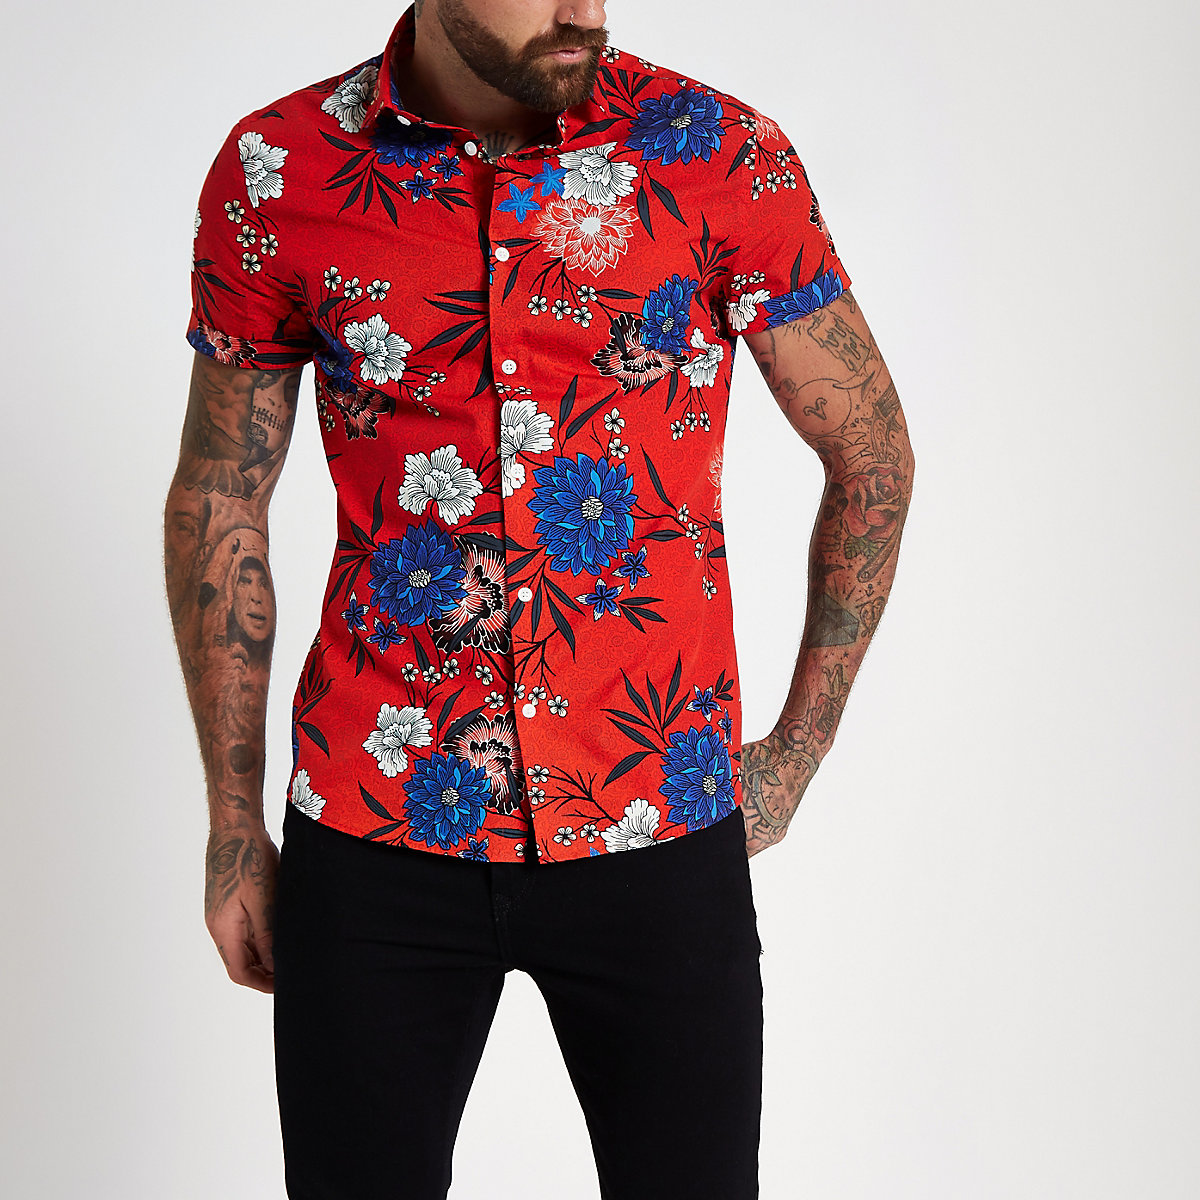 Red floral print short sleeve shirt